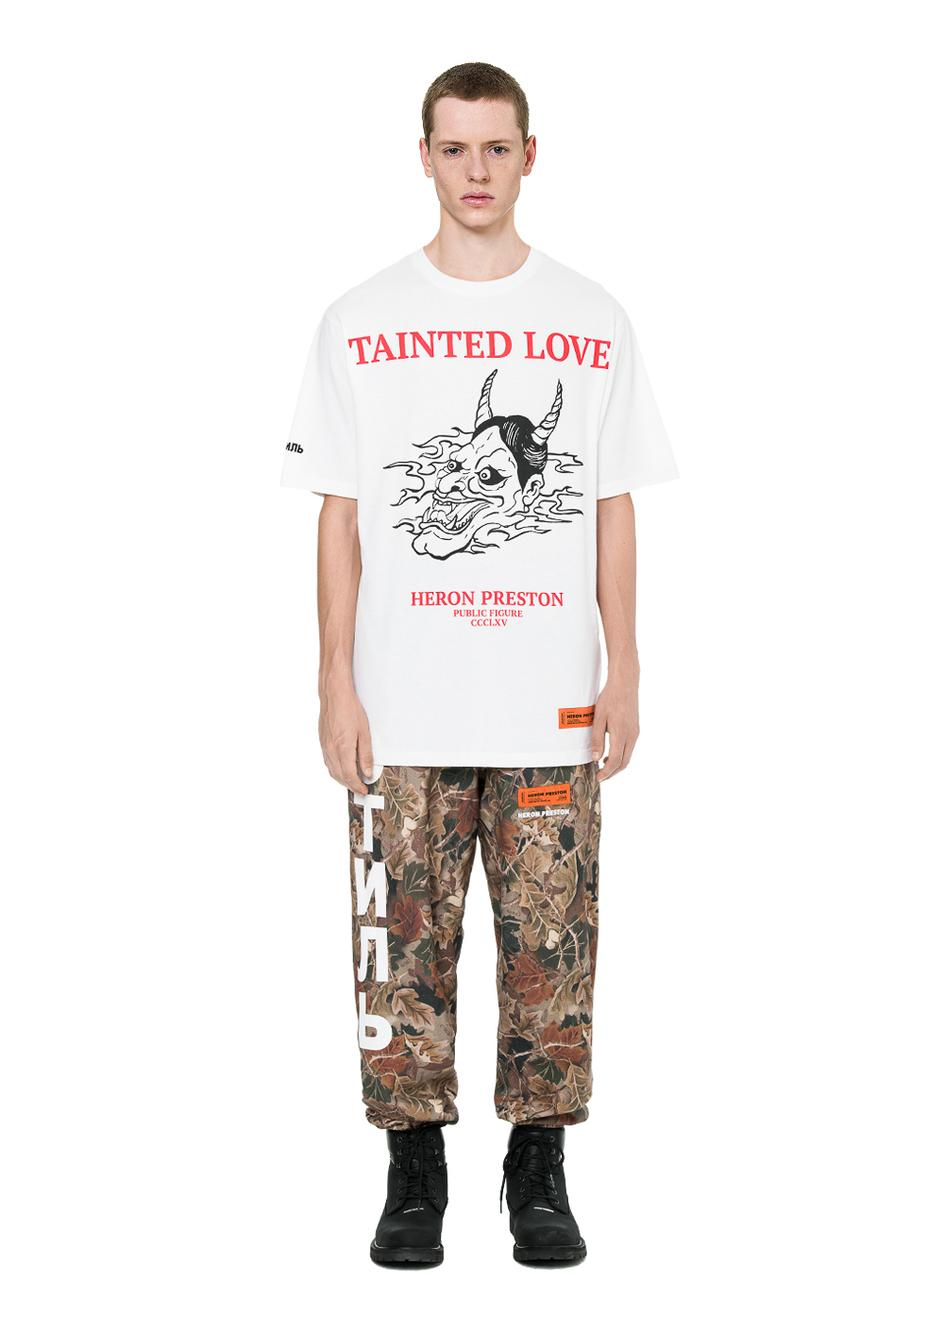 Heron Preston T Shirt Men Women High Quality Tainted Love Dragon Print Loose Fit Hip Hop Top Tees Heron Preston T Shirts